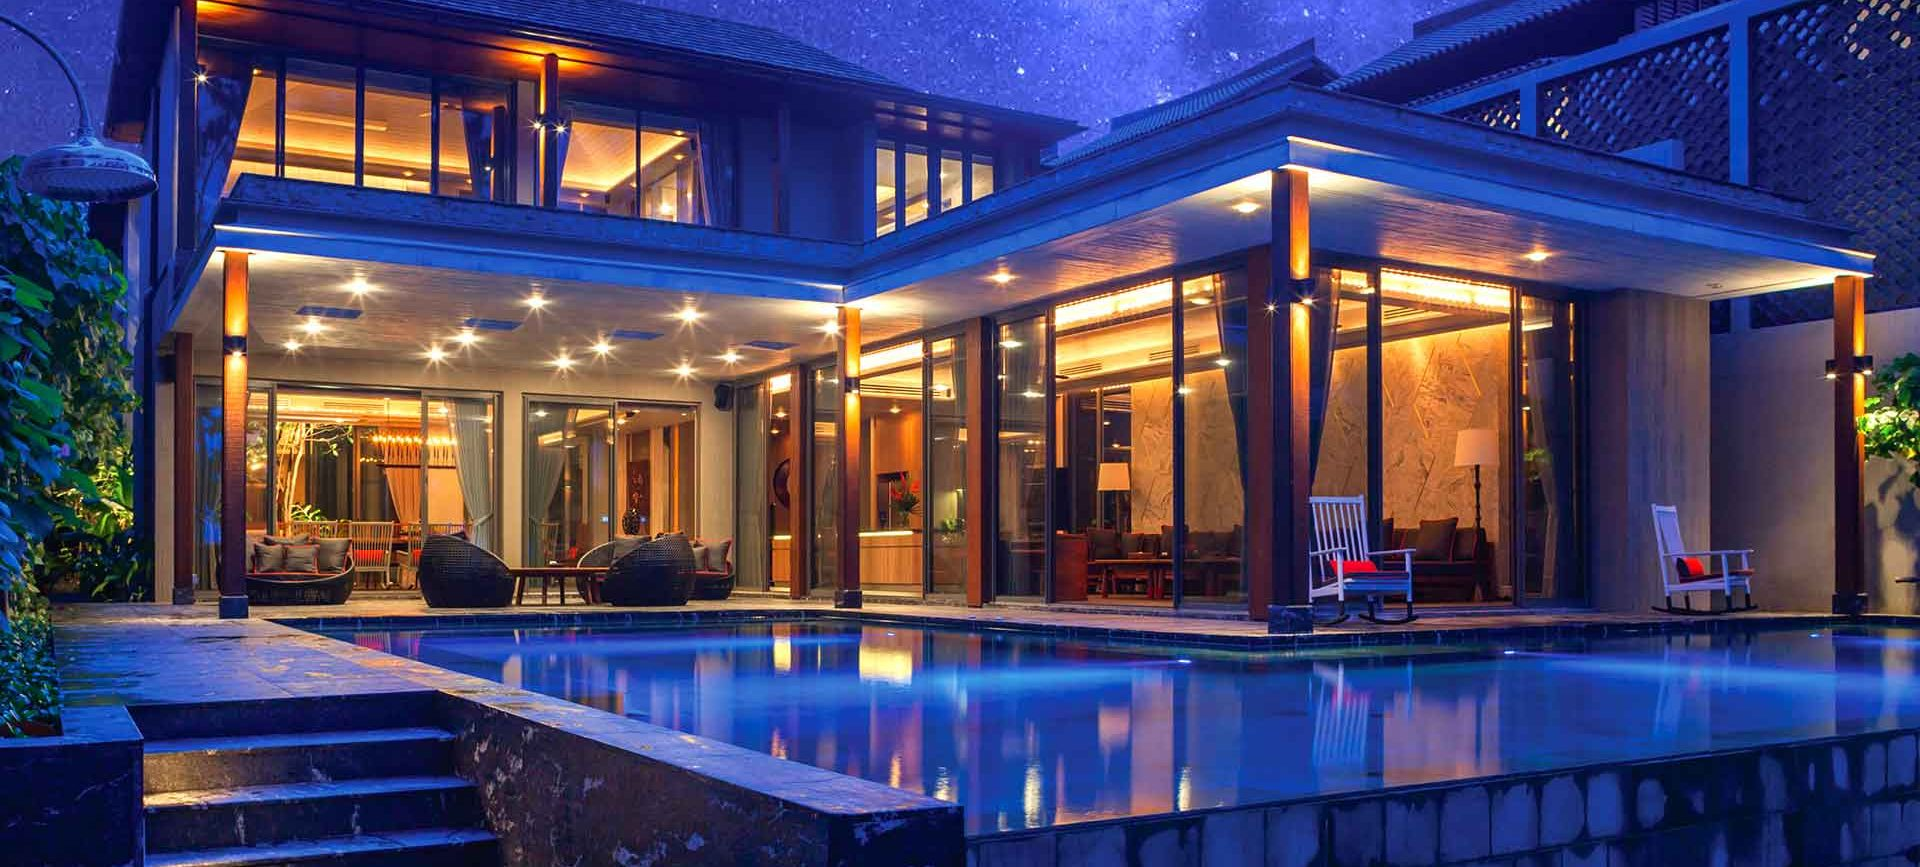 Baba Beach Club Phuket - Beachfront Pool Villa Hotel